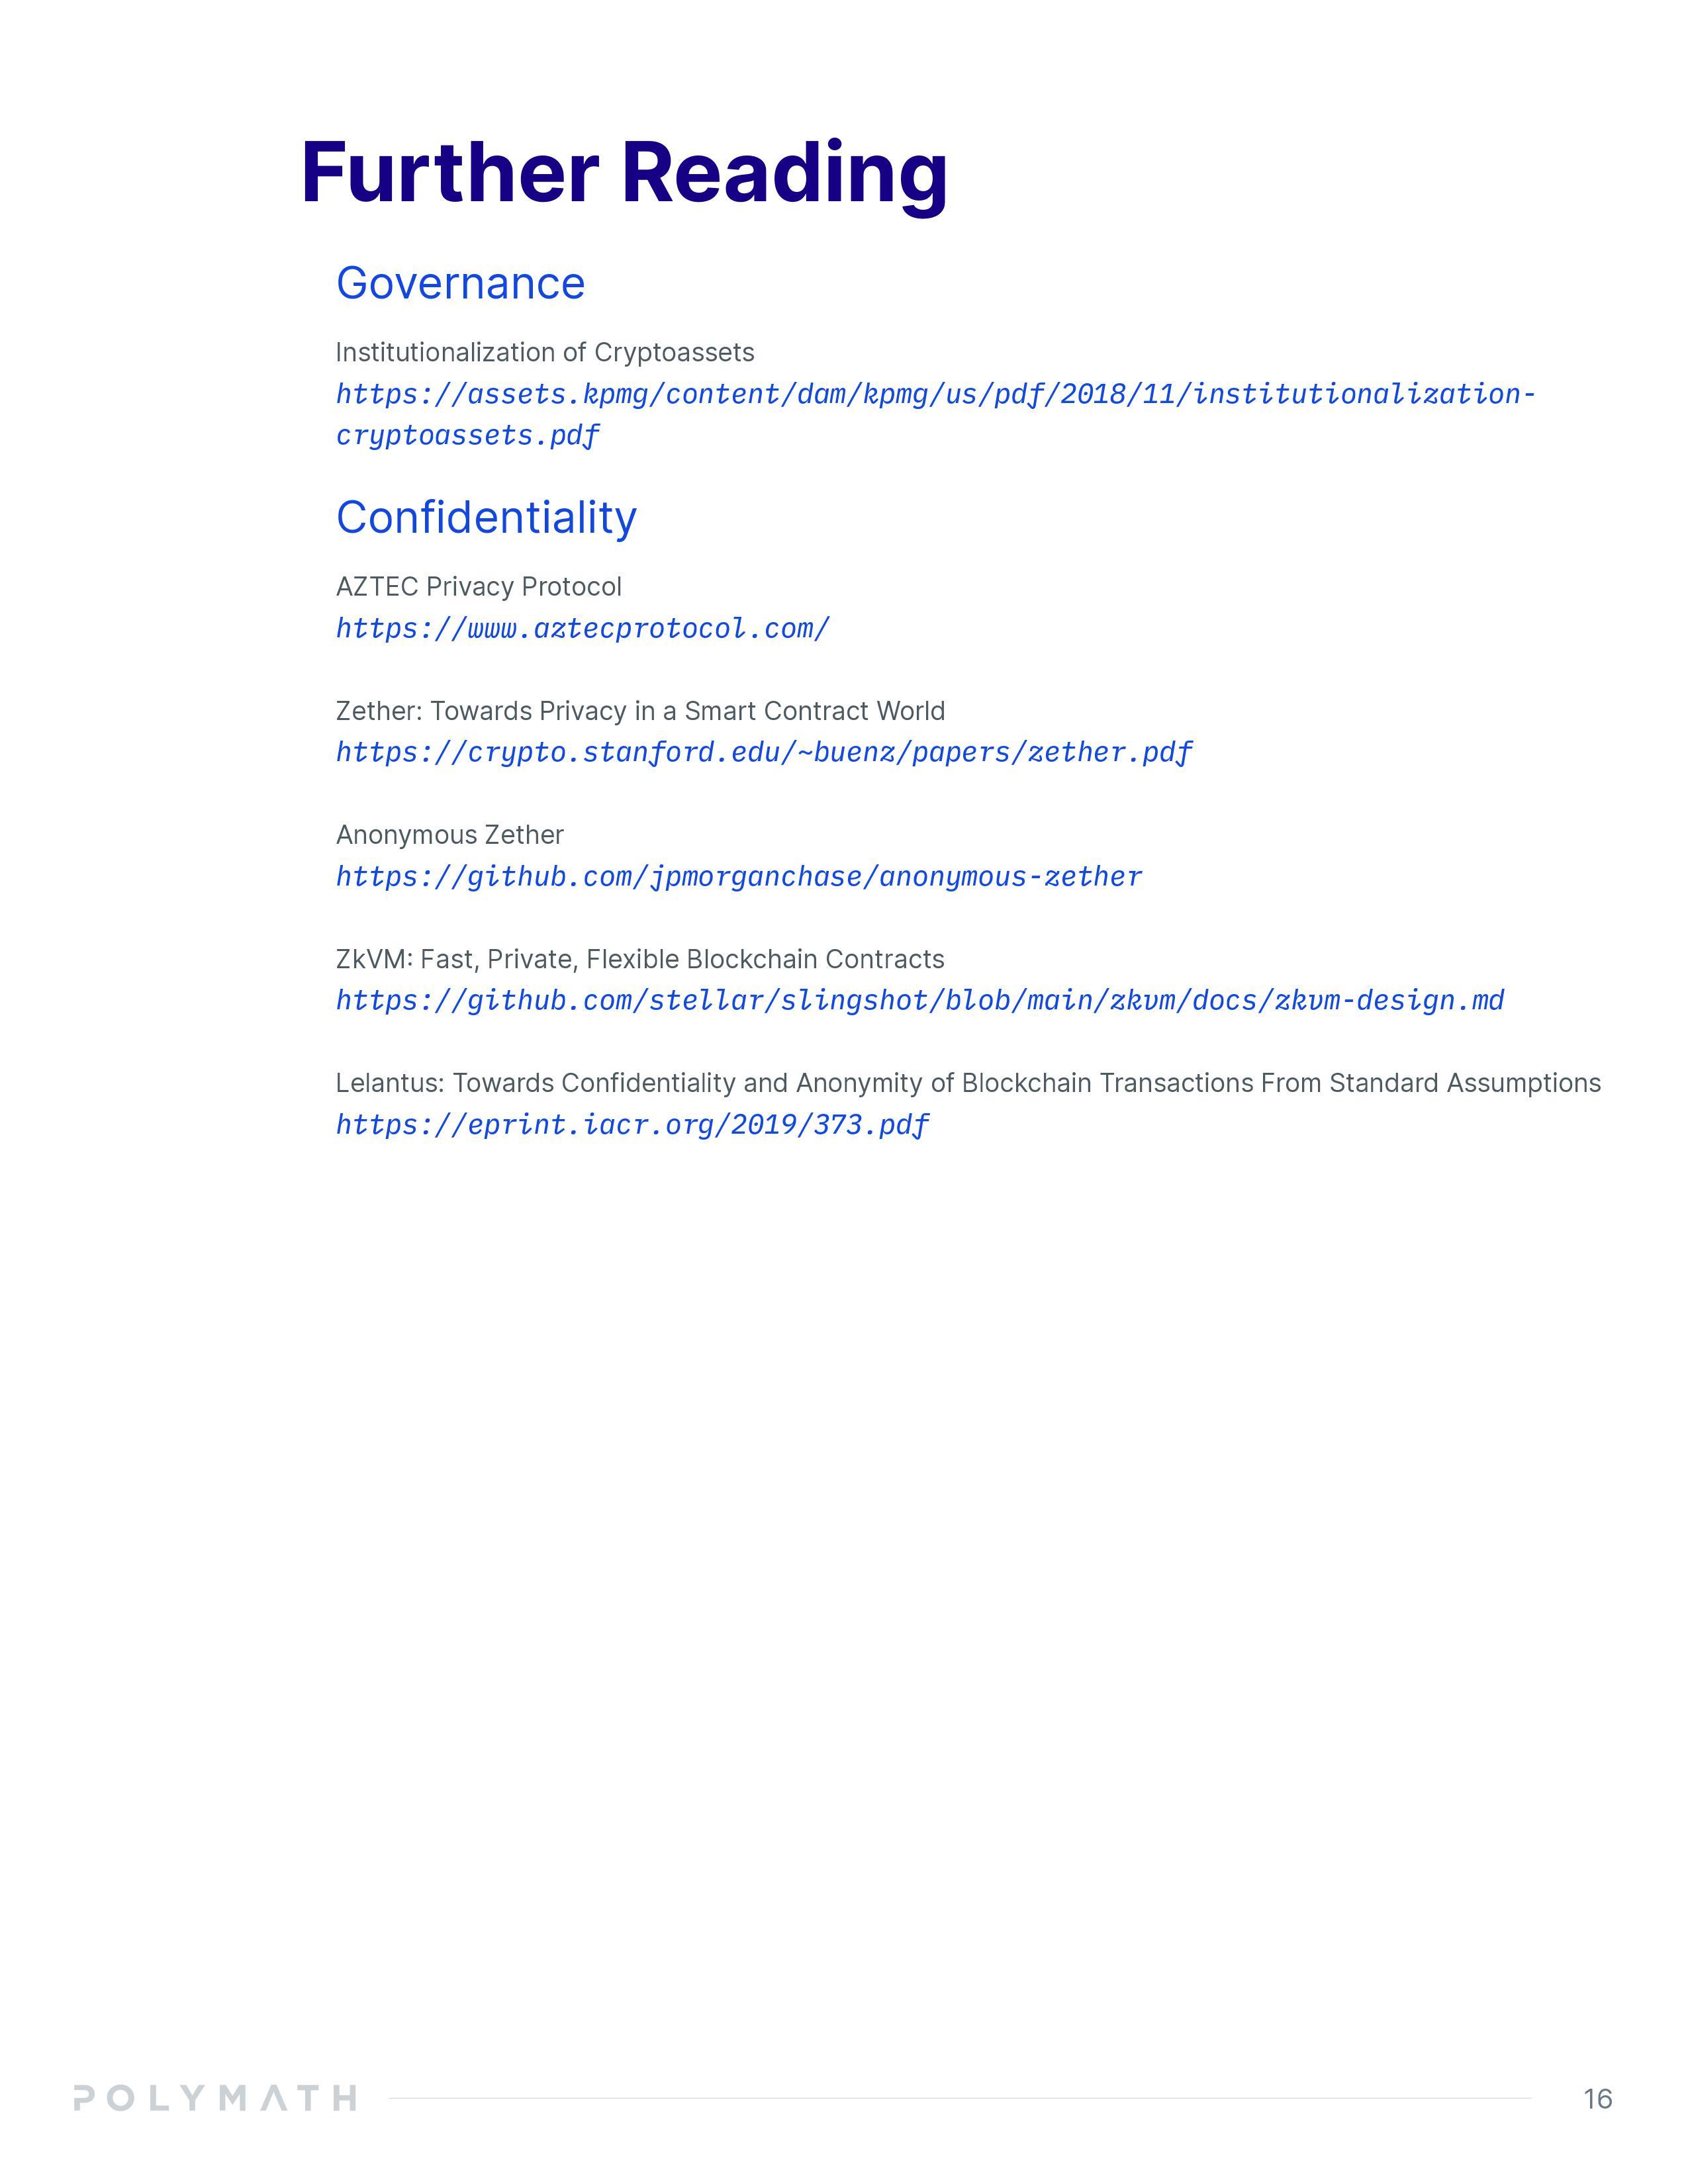 Polymath Whitepaper Page 20